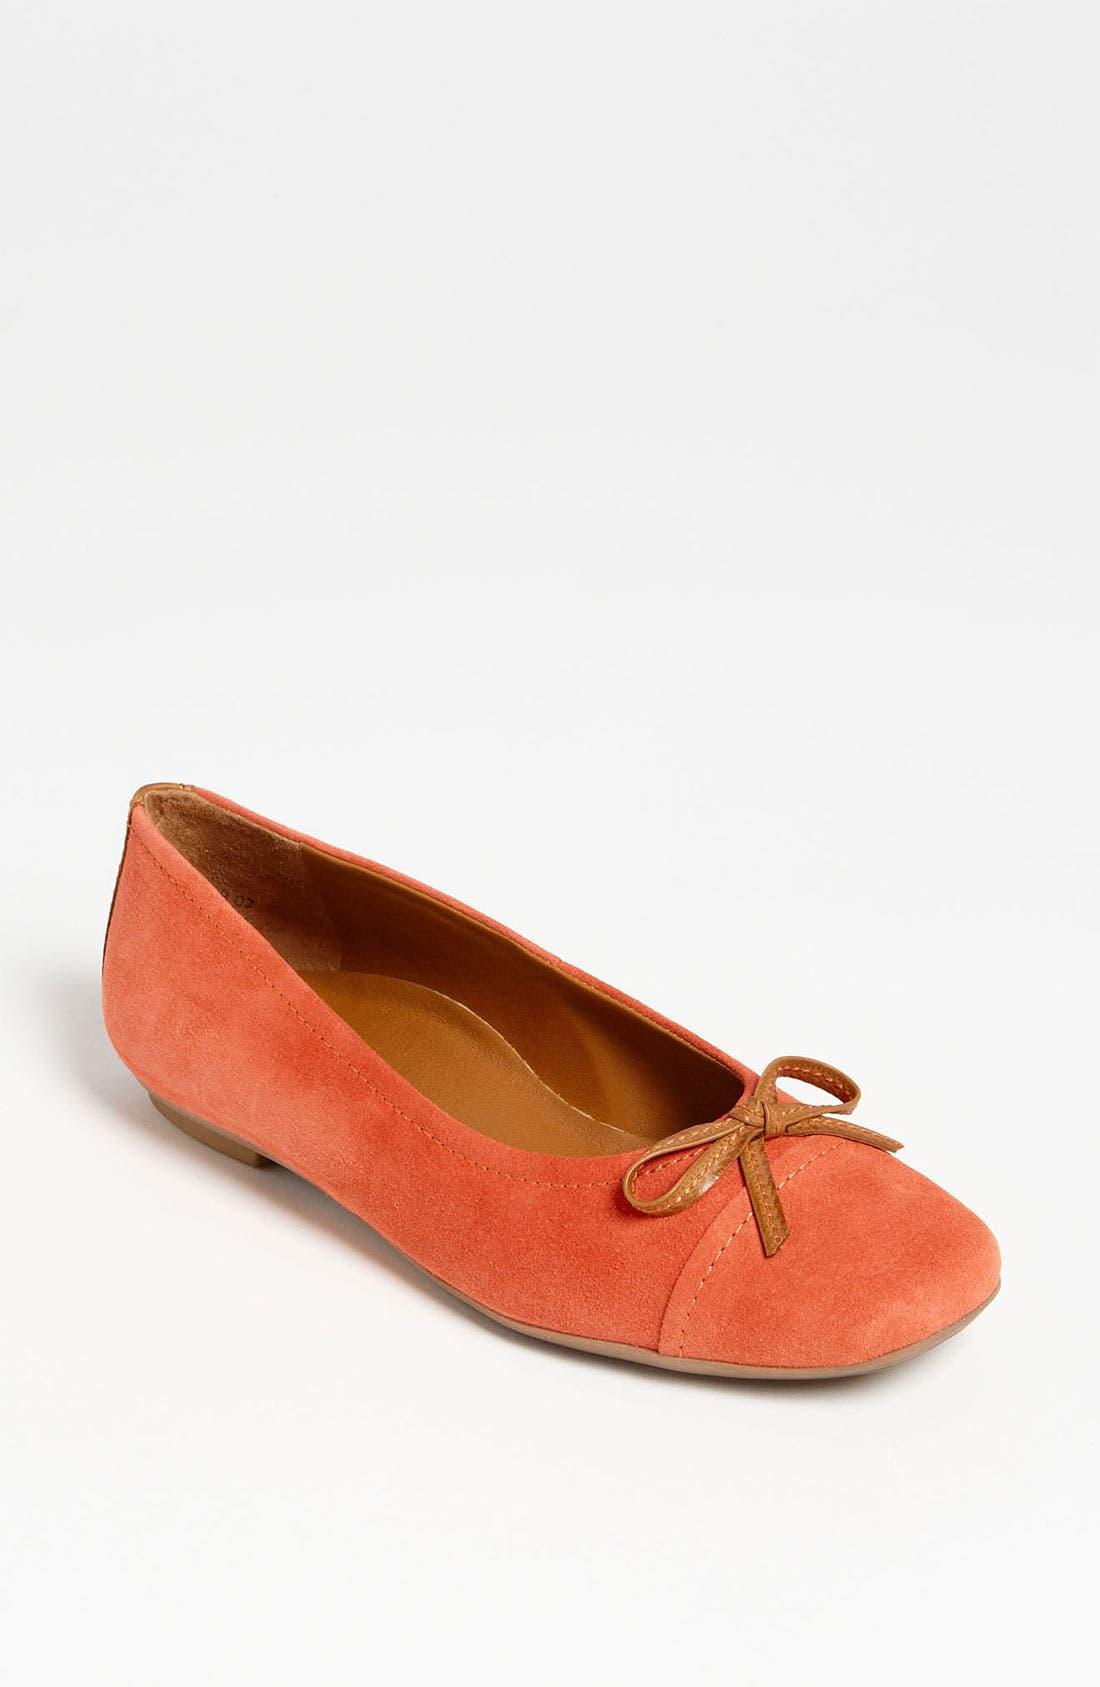 Alternate Image 1 Selected - Paul Green 'Phoebe' Ballet Flat